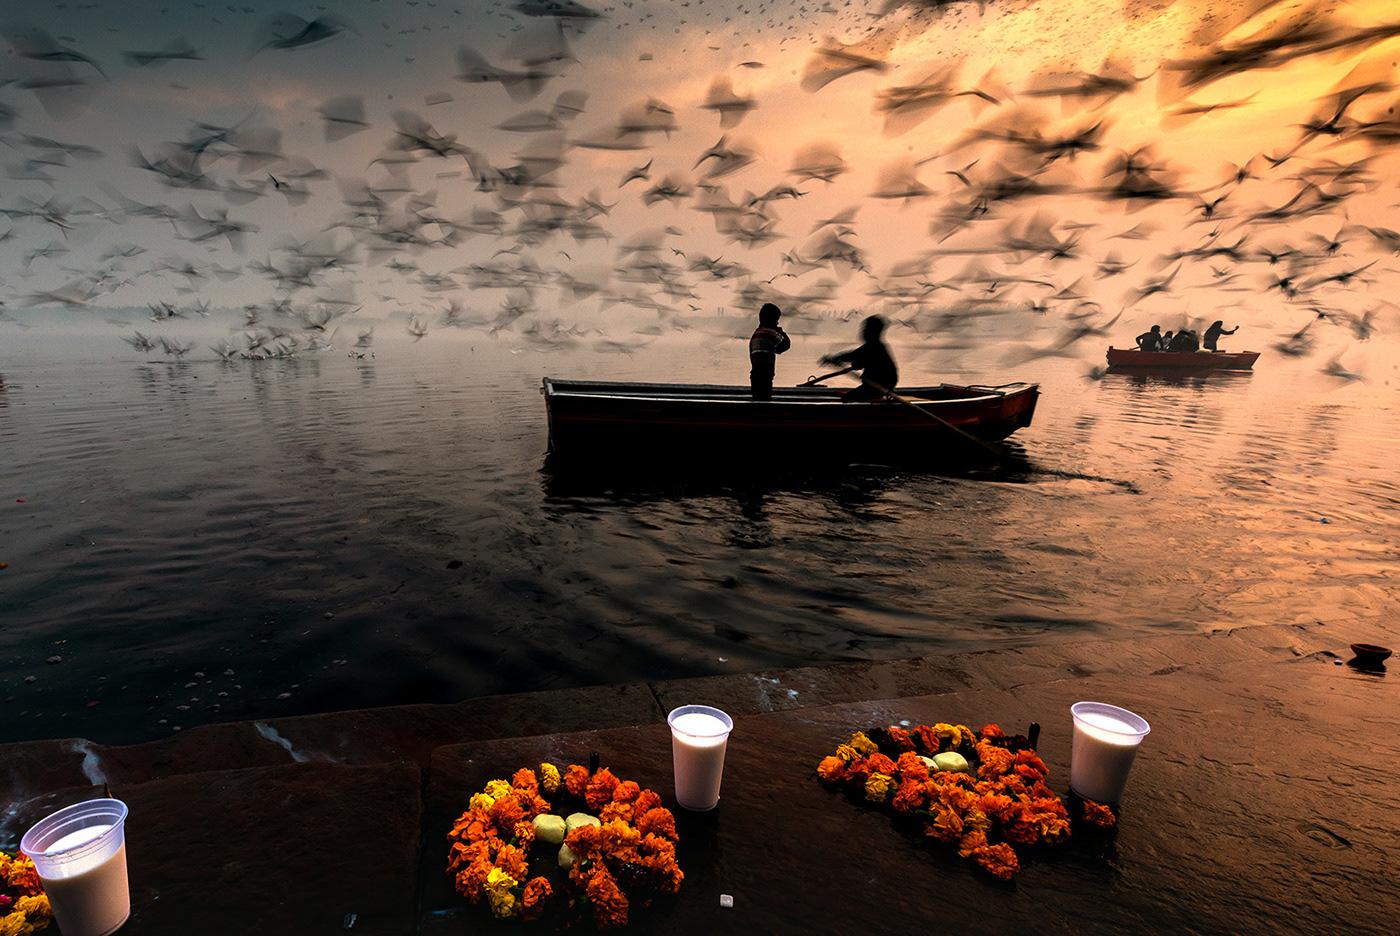 Image may contain: water, boat and lake